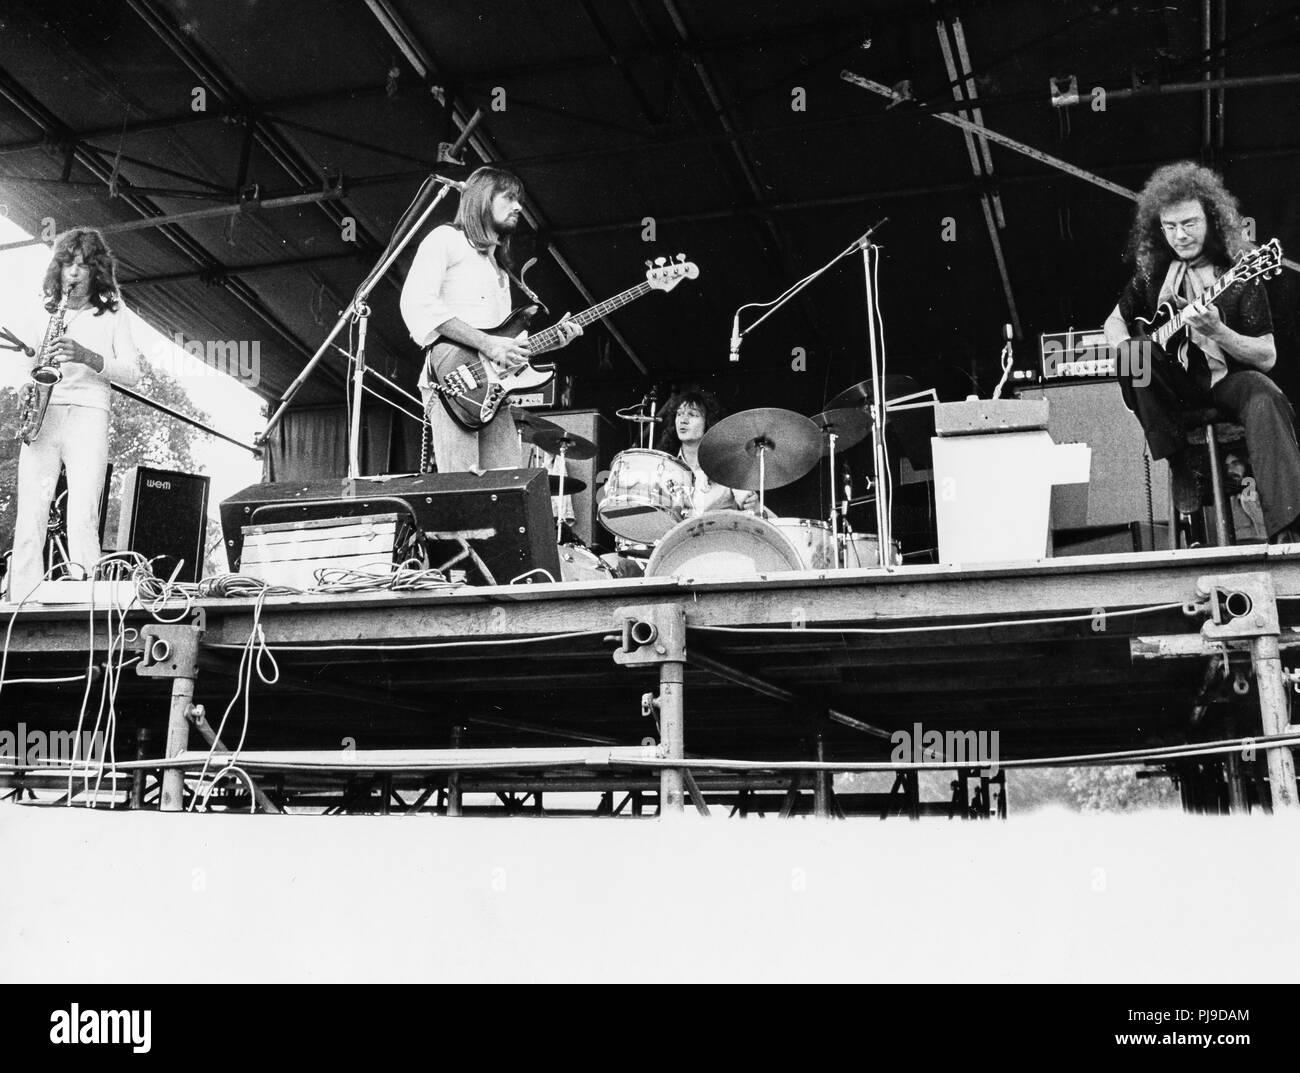 King Crimson, 70 Photo Stock